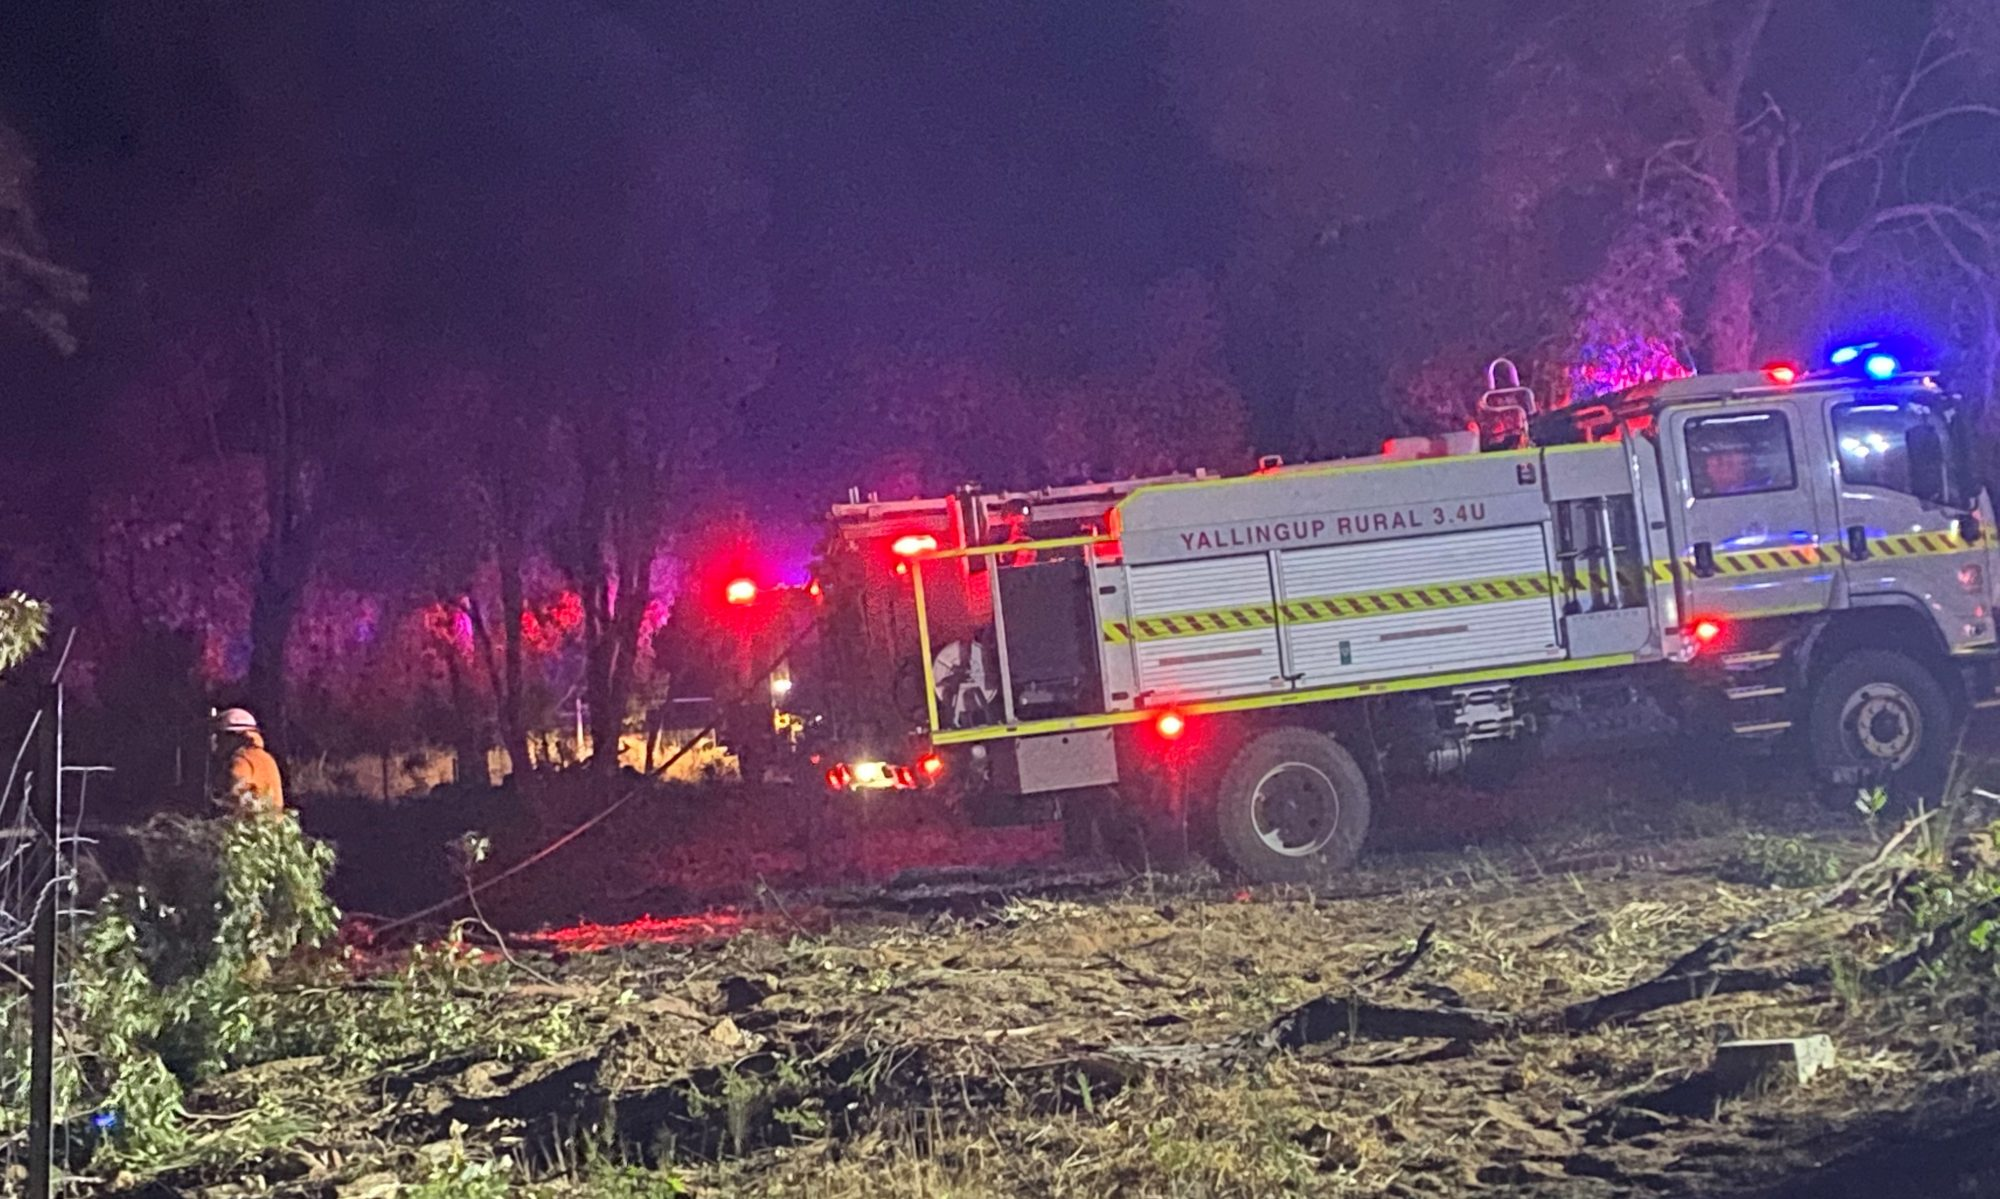 Yallingup Rural Volunteer Bush Fire Brigade